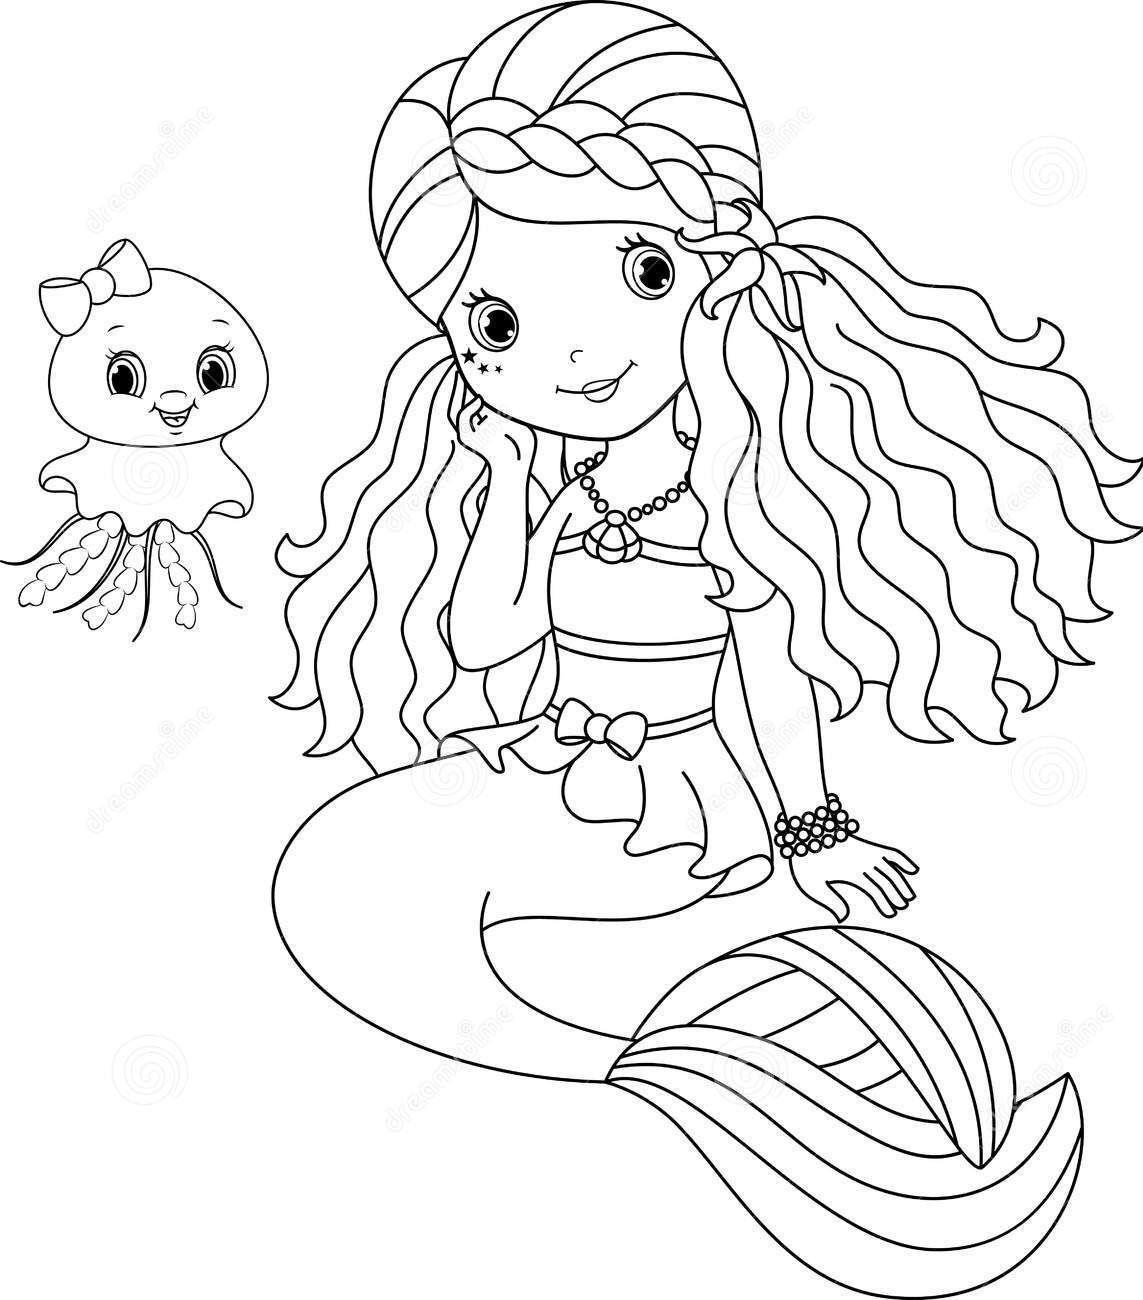 Dreamstime Com Mermaid Mermaid Coloring Book Mermaid Coloring Pages Ariel Coloring Pages